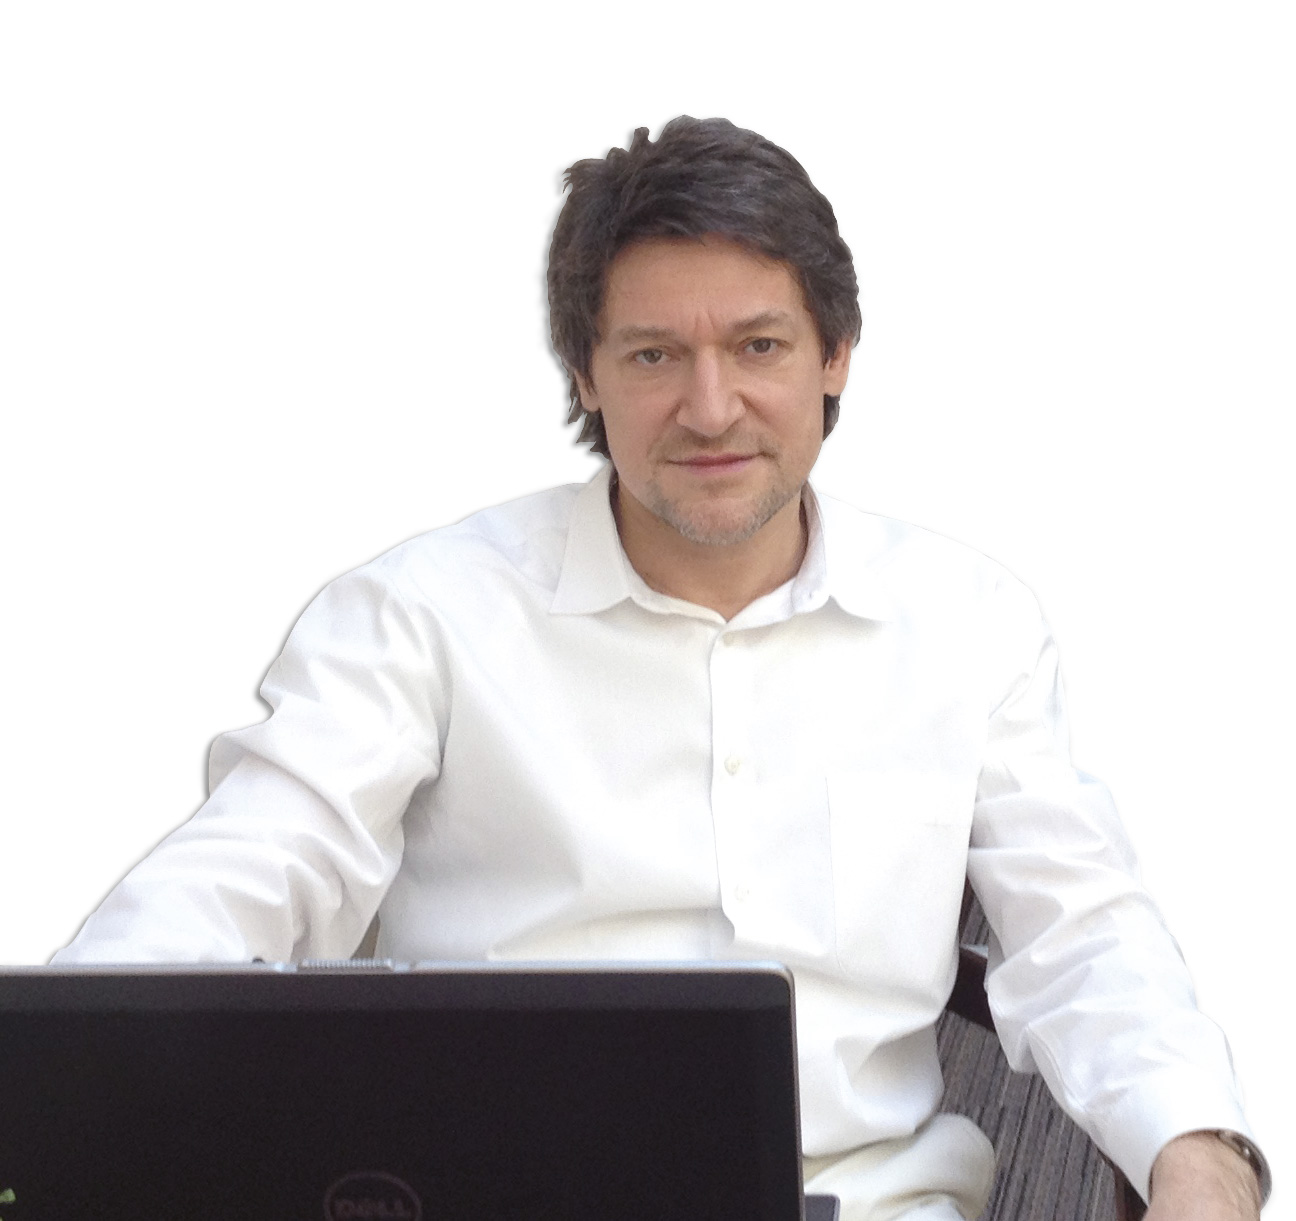 Jerzy Hurnik, Dyrektor ds. Rozwoju, Handlu i Marketingu Virtu